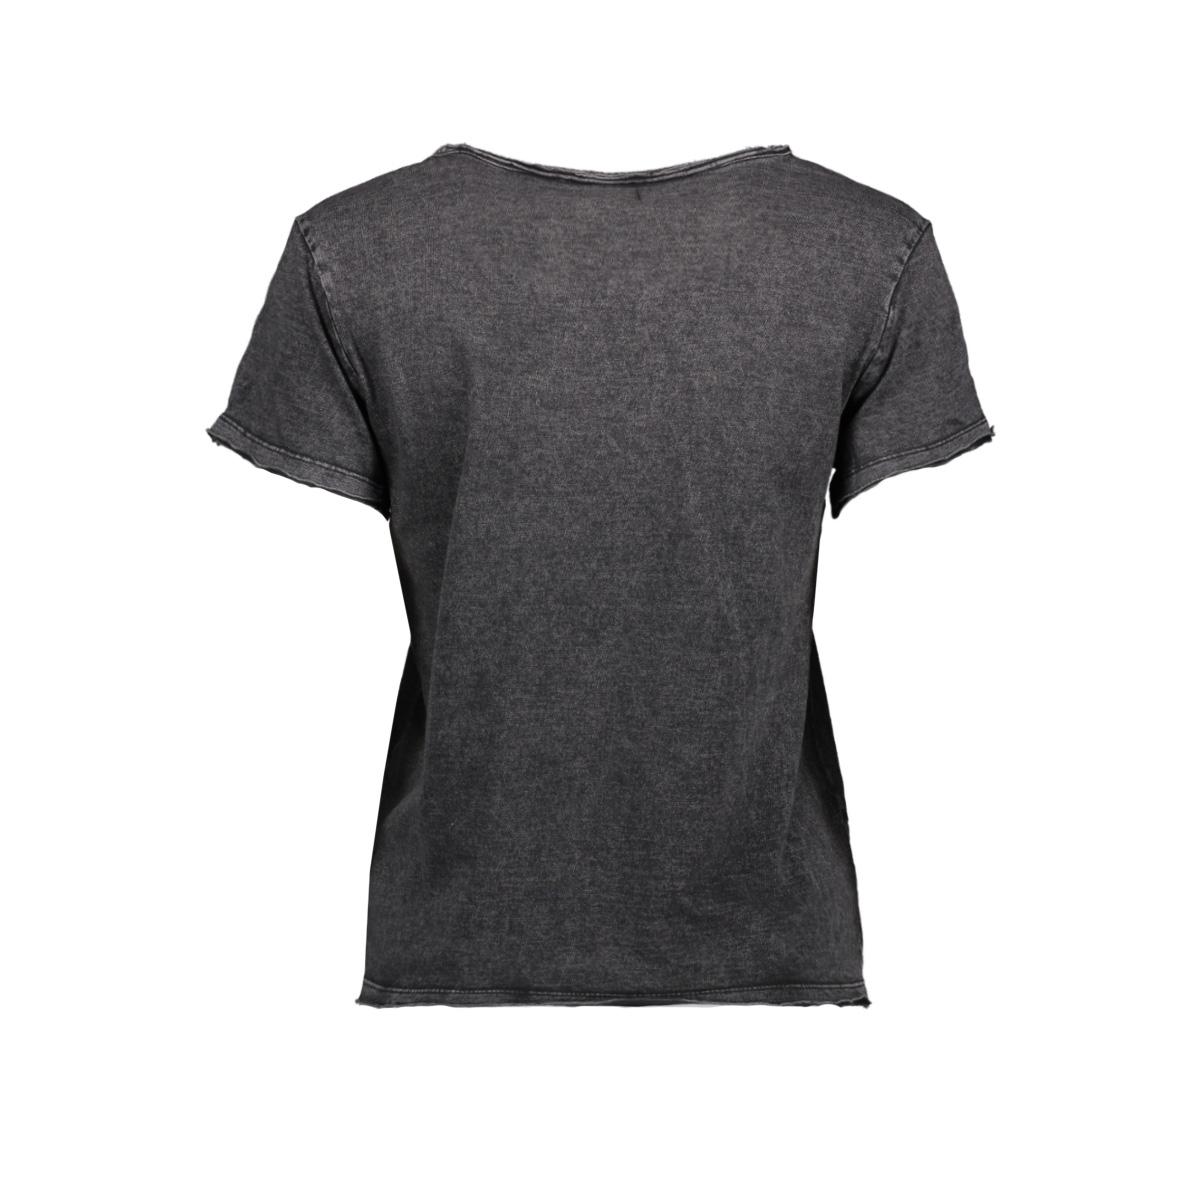 nmnaya nate  s/s washed top noos 27008771 noisy may t-shirt black/washed